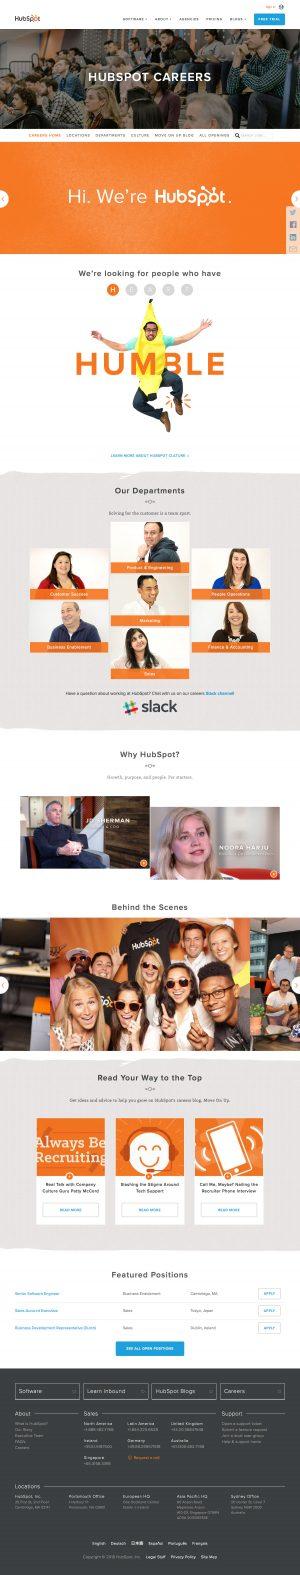 Jobs career saas page inspiration - HubSpot